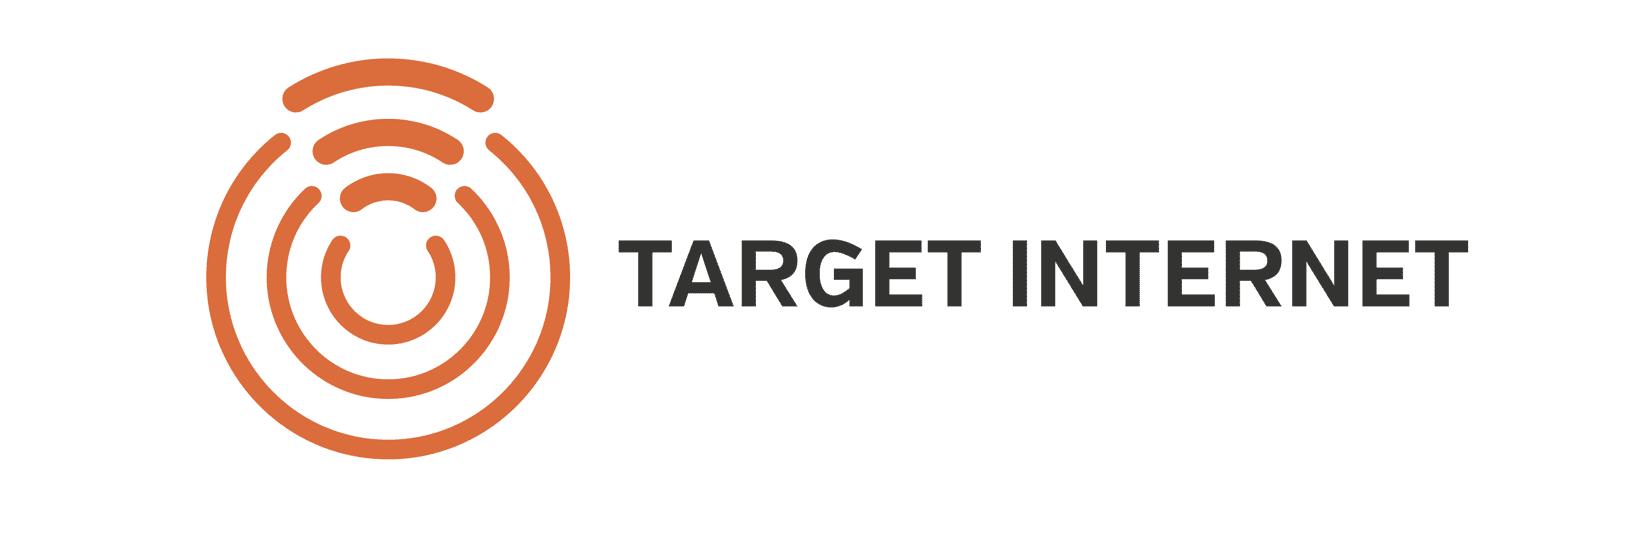 Target Internet